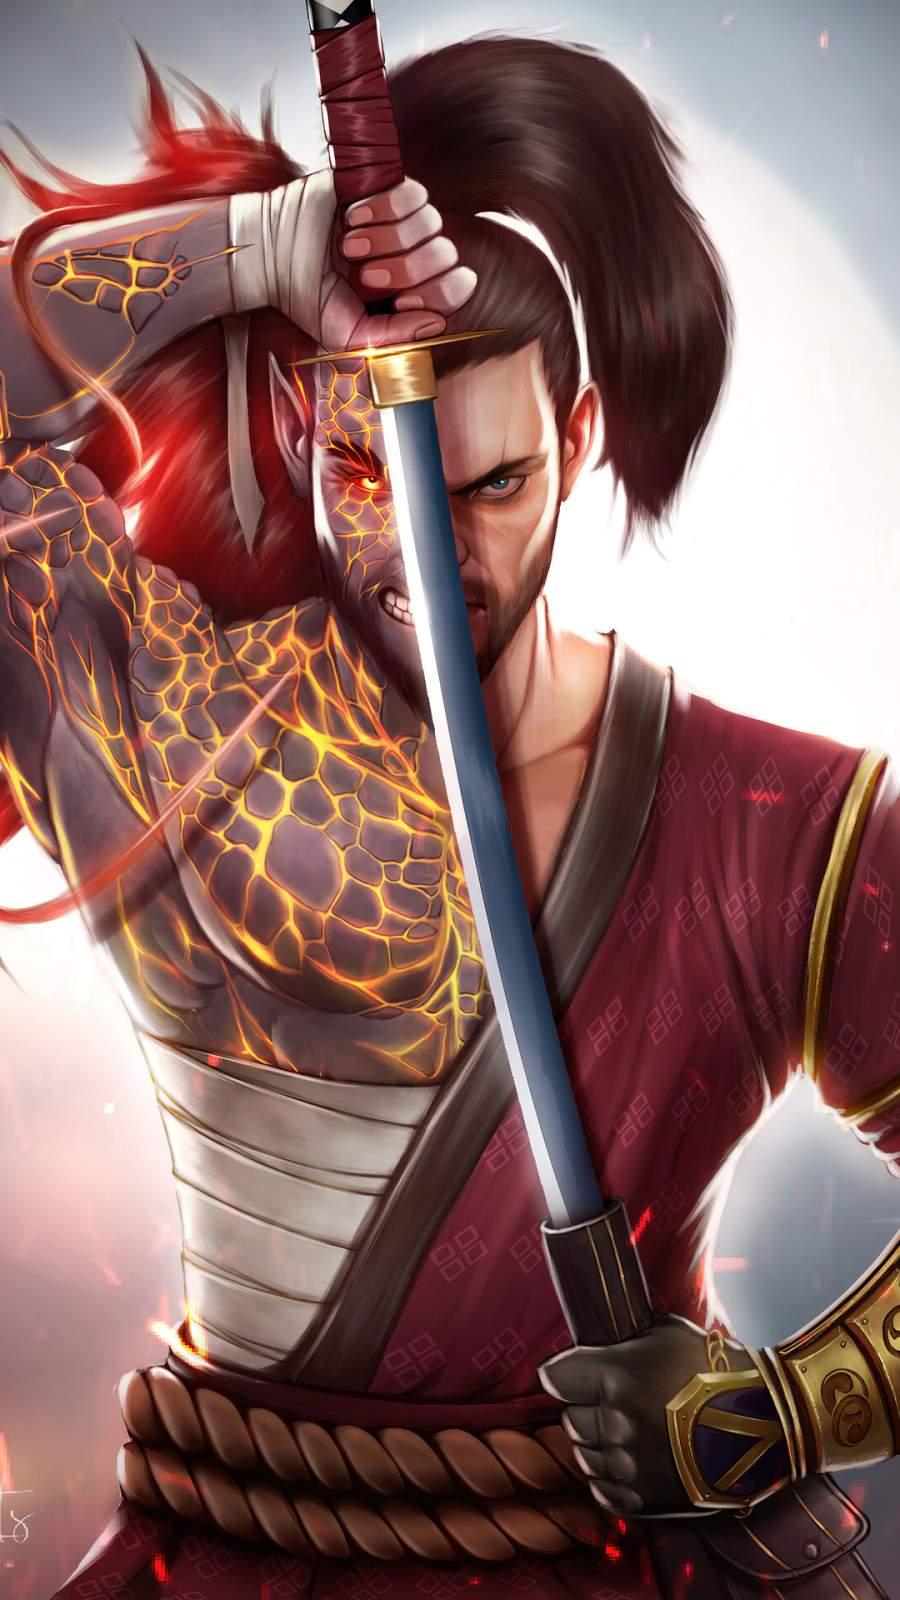 Takashi Ninja Warrior iPhone Wallpaper